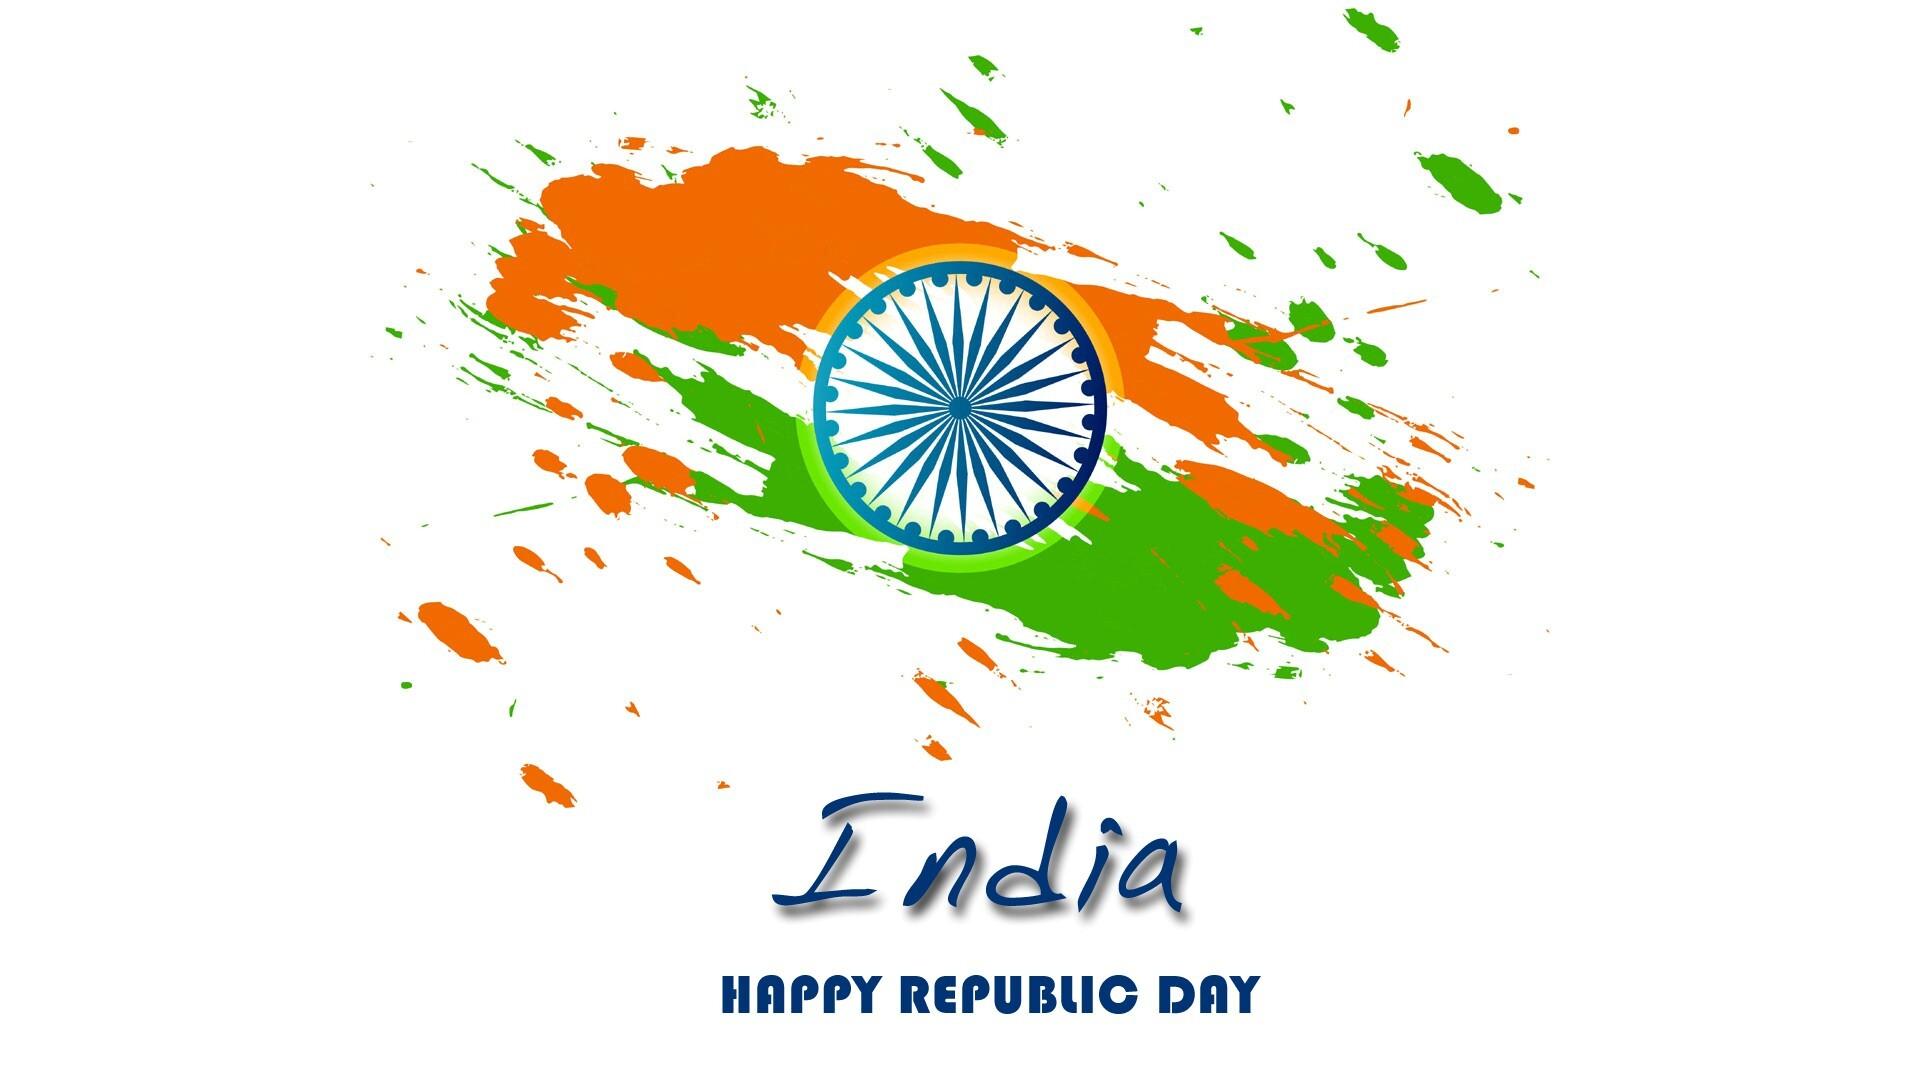 26 January Happy Republic Day Hd Desktop Photo Background Hd